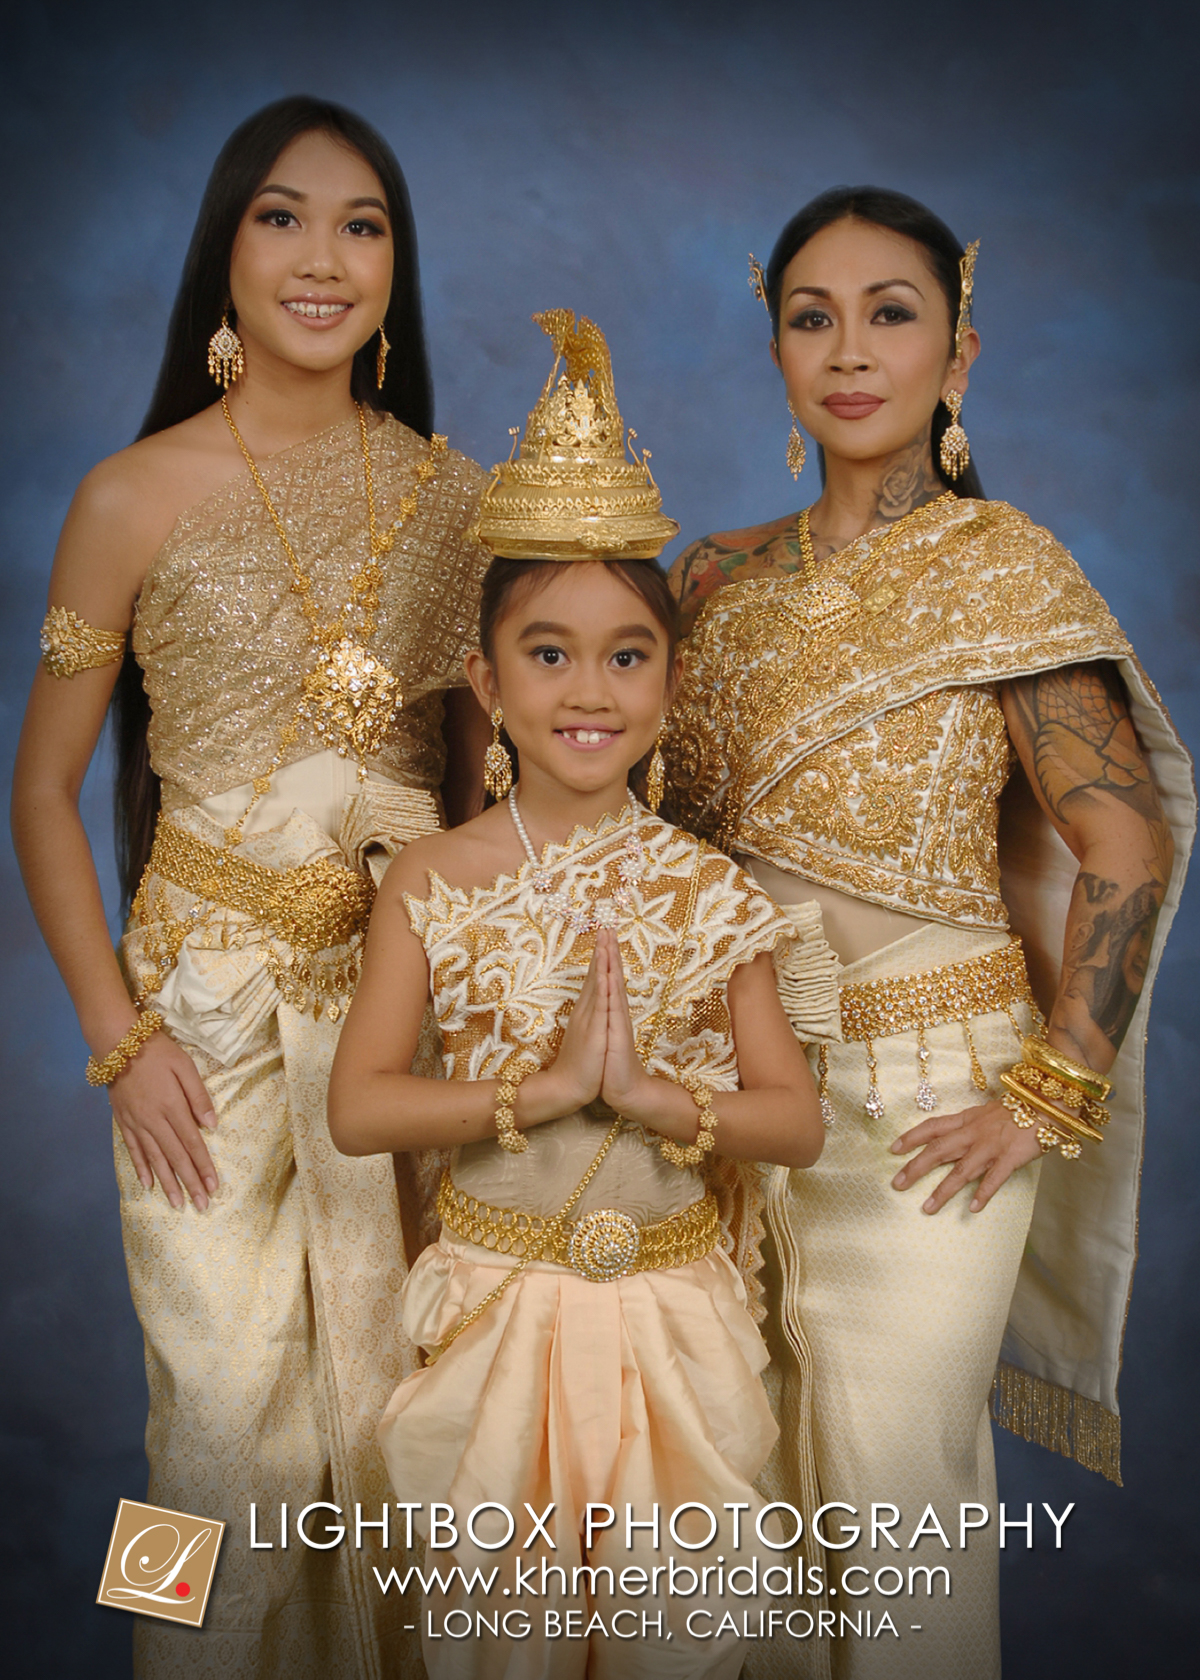 Apsara Khmer Bridal Wedding Photography and video-212.jpg